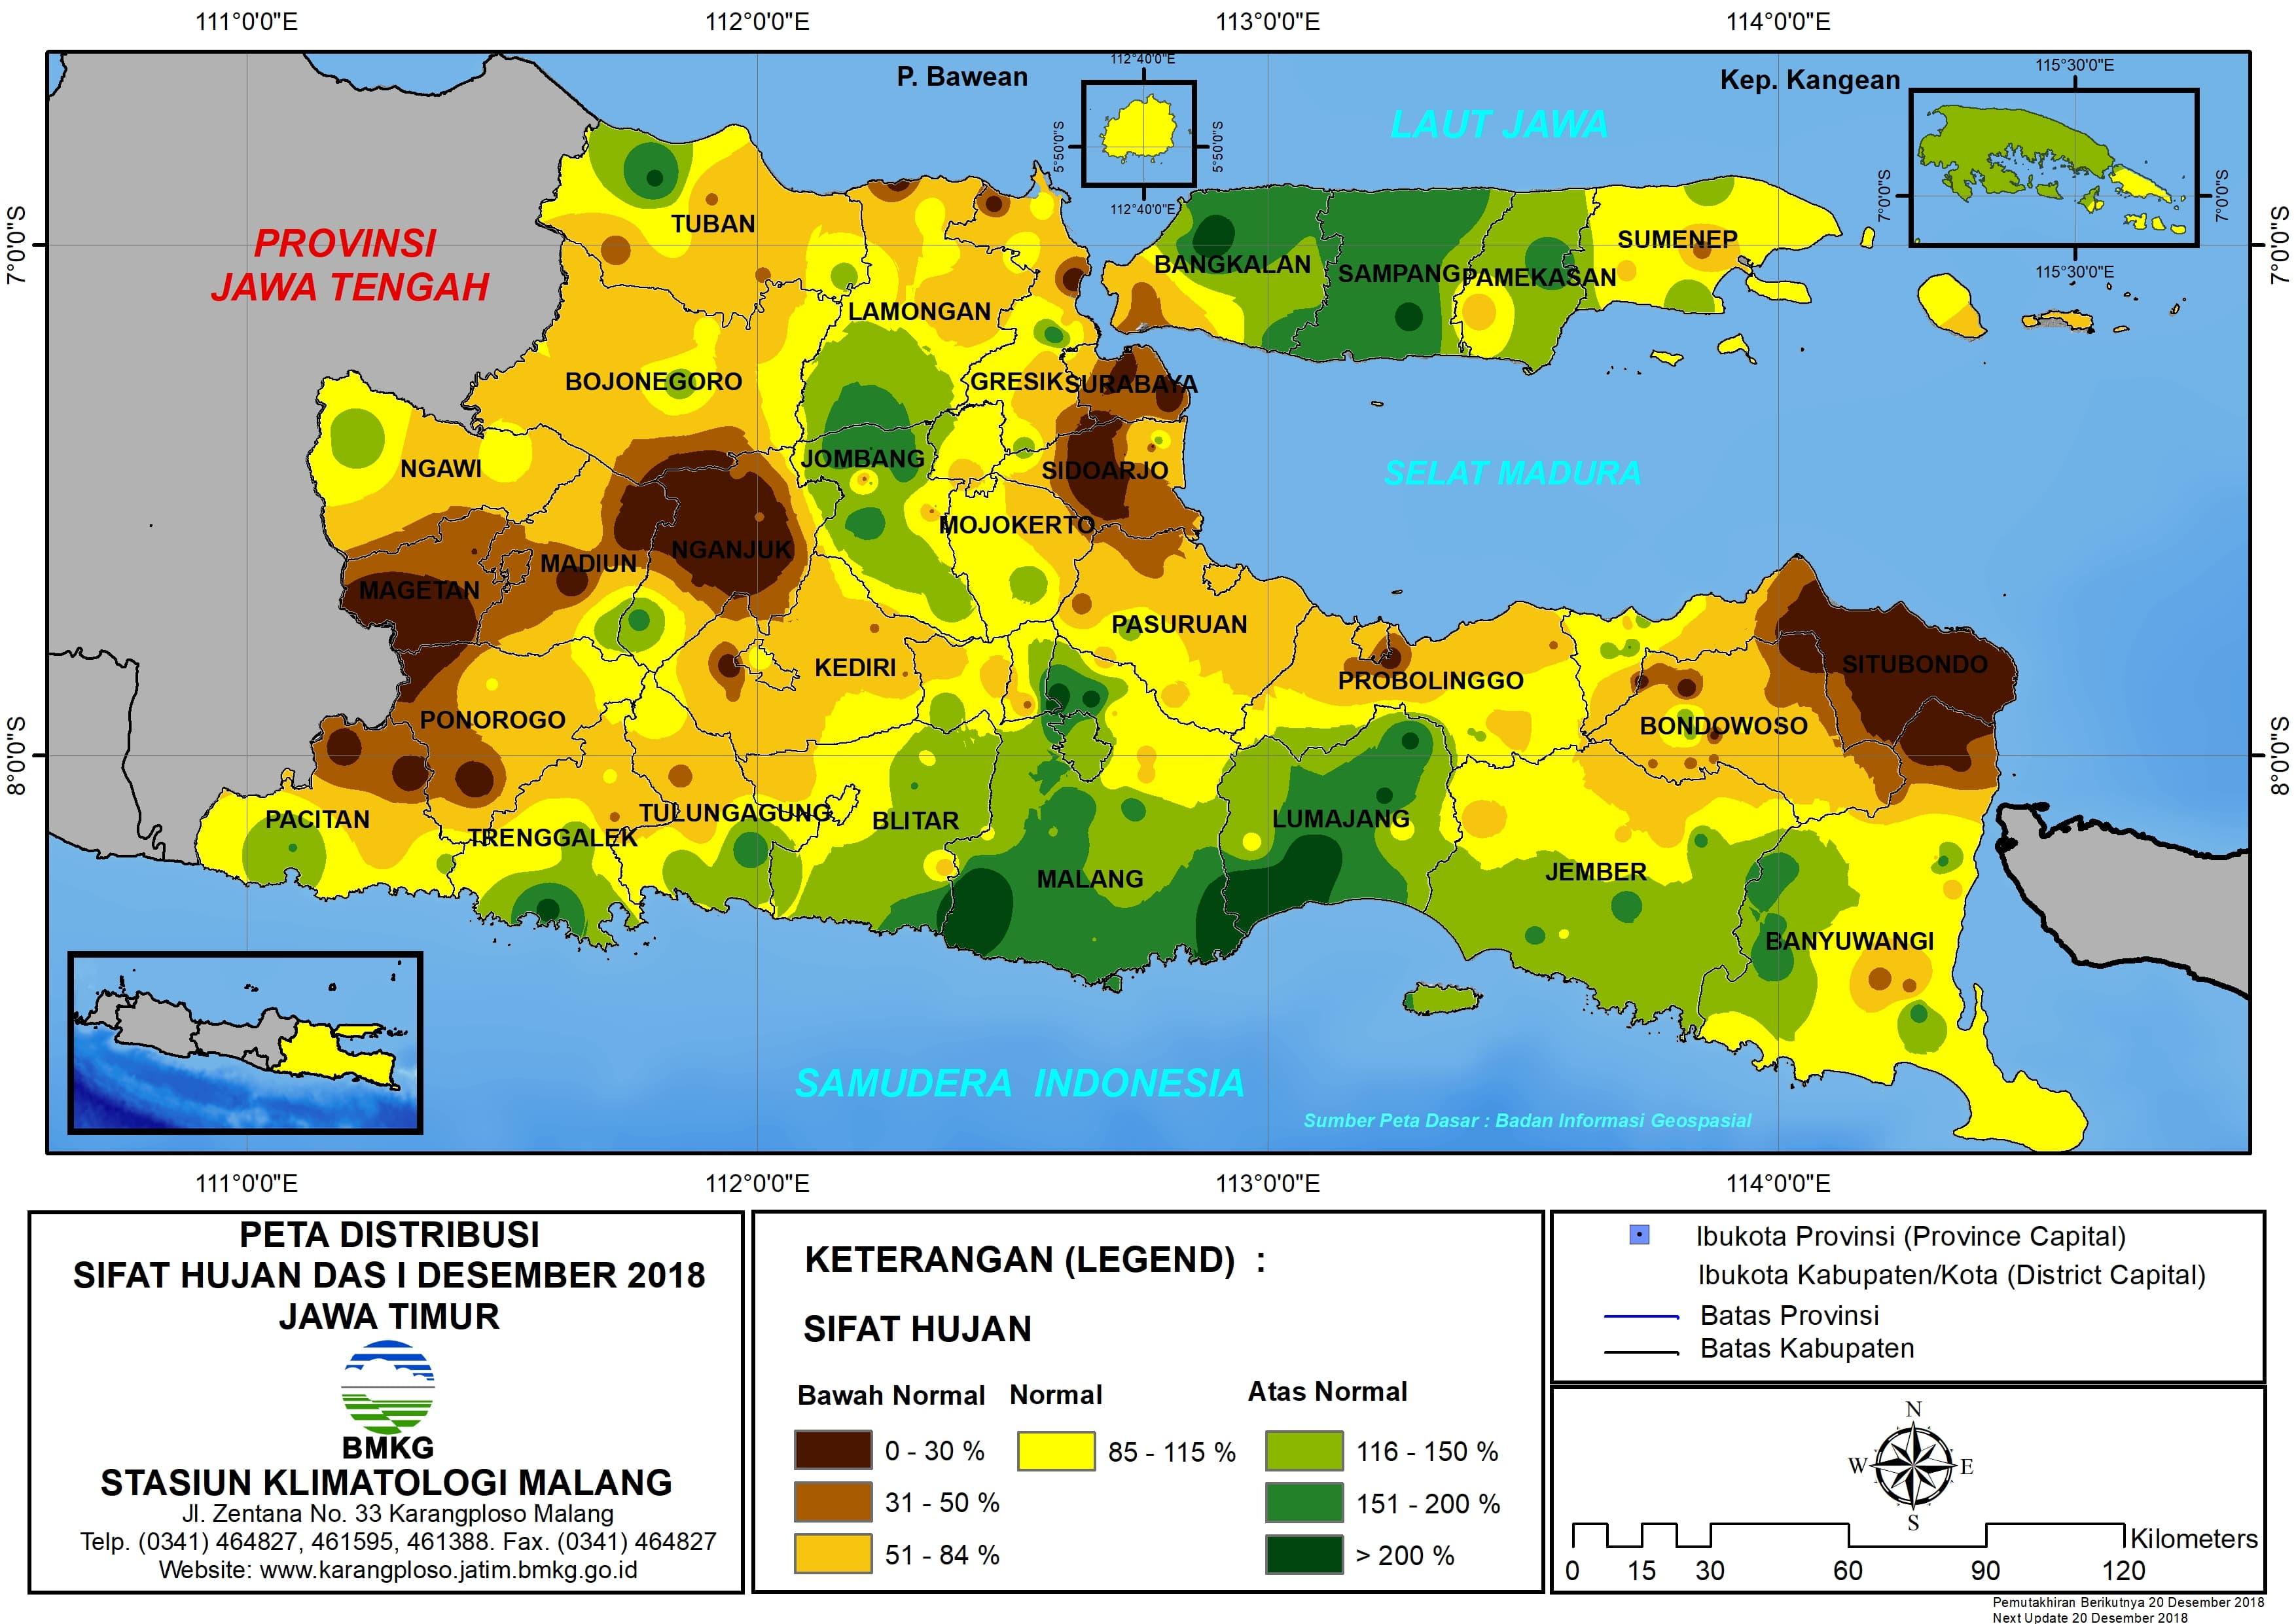 Peta Analisis Distribusi Sifat Hujan Dasarian I Desember 2018 di Provinsi Jawa Timur